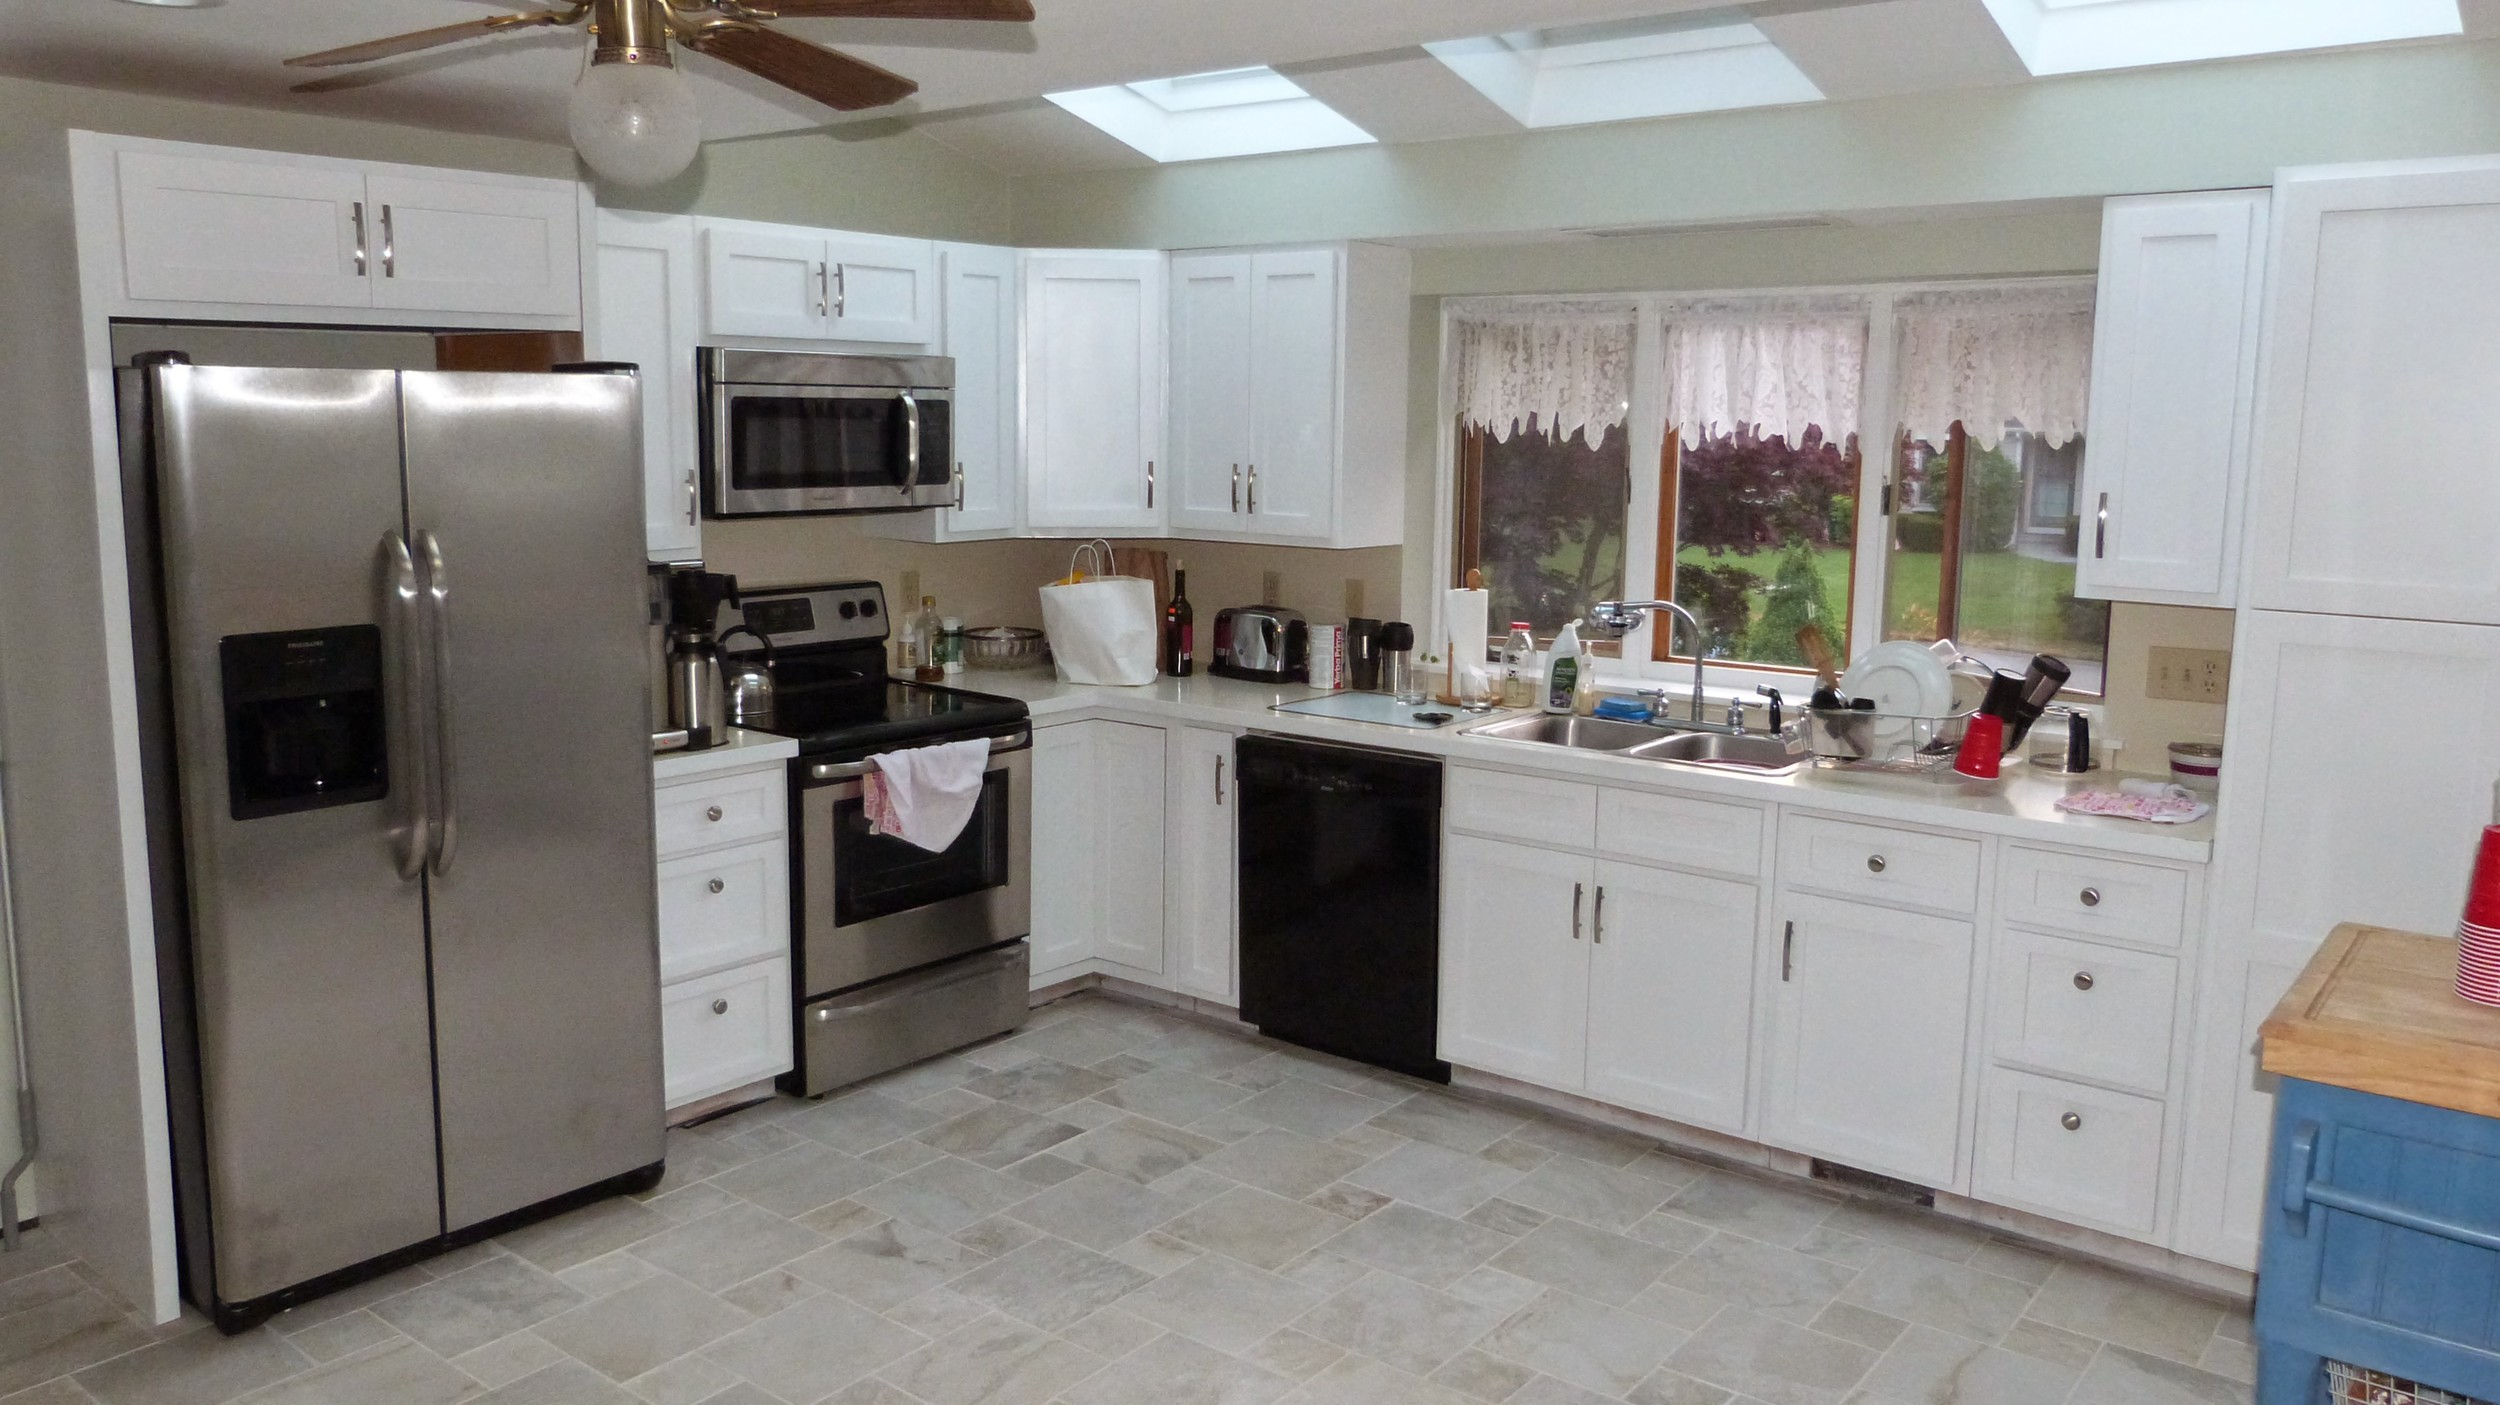 Kitchen Facelift Kitchen Remodels Carolina Customized Interiors Llc